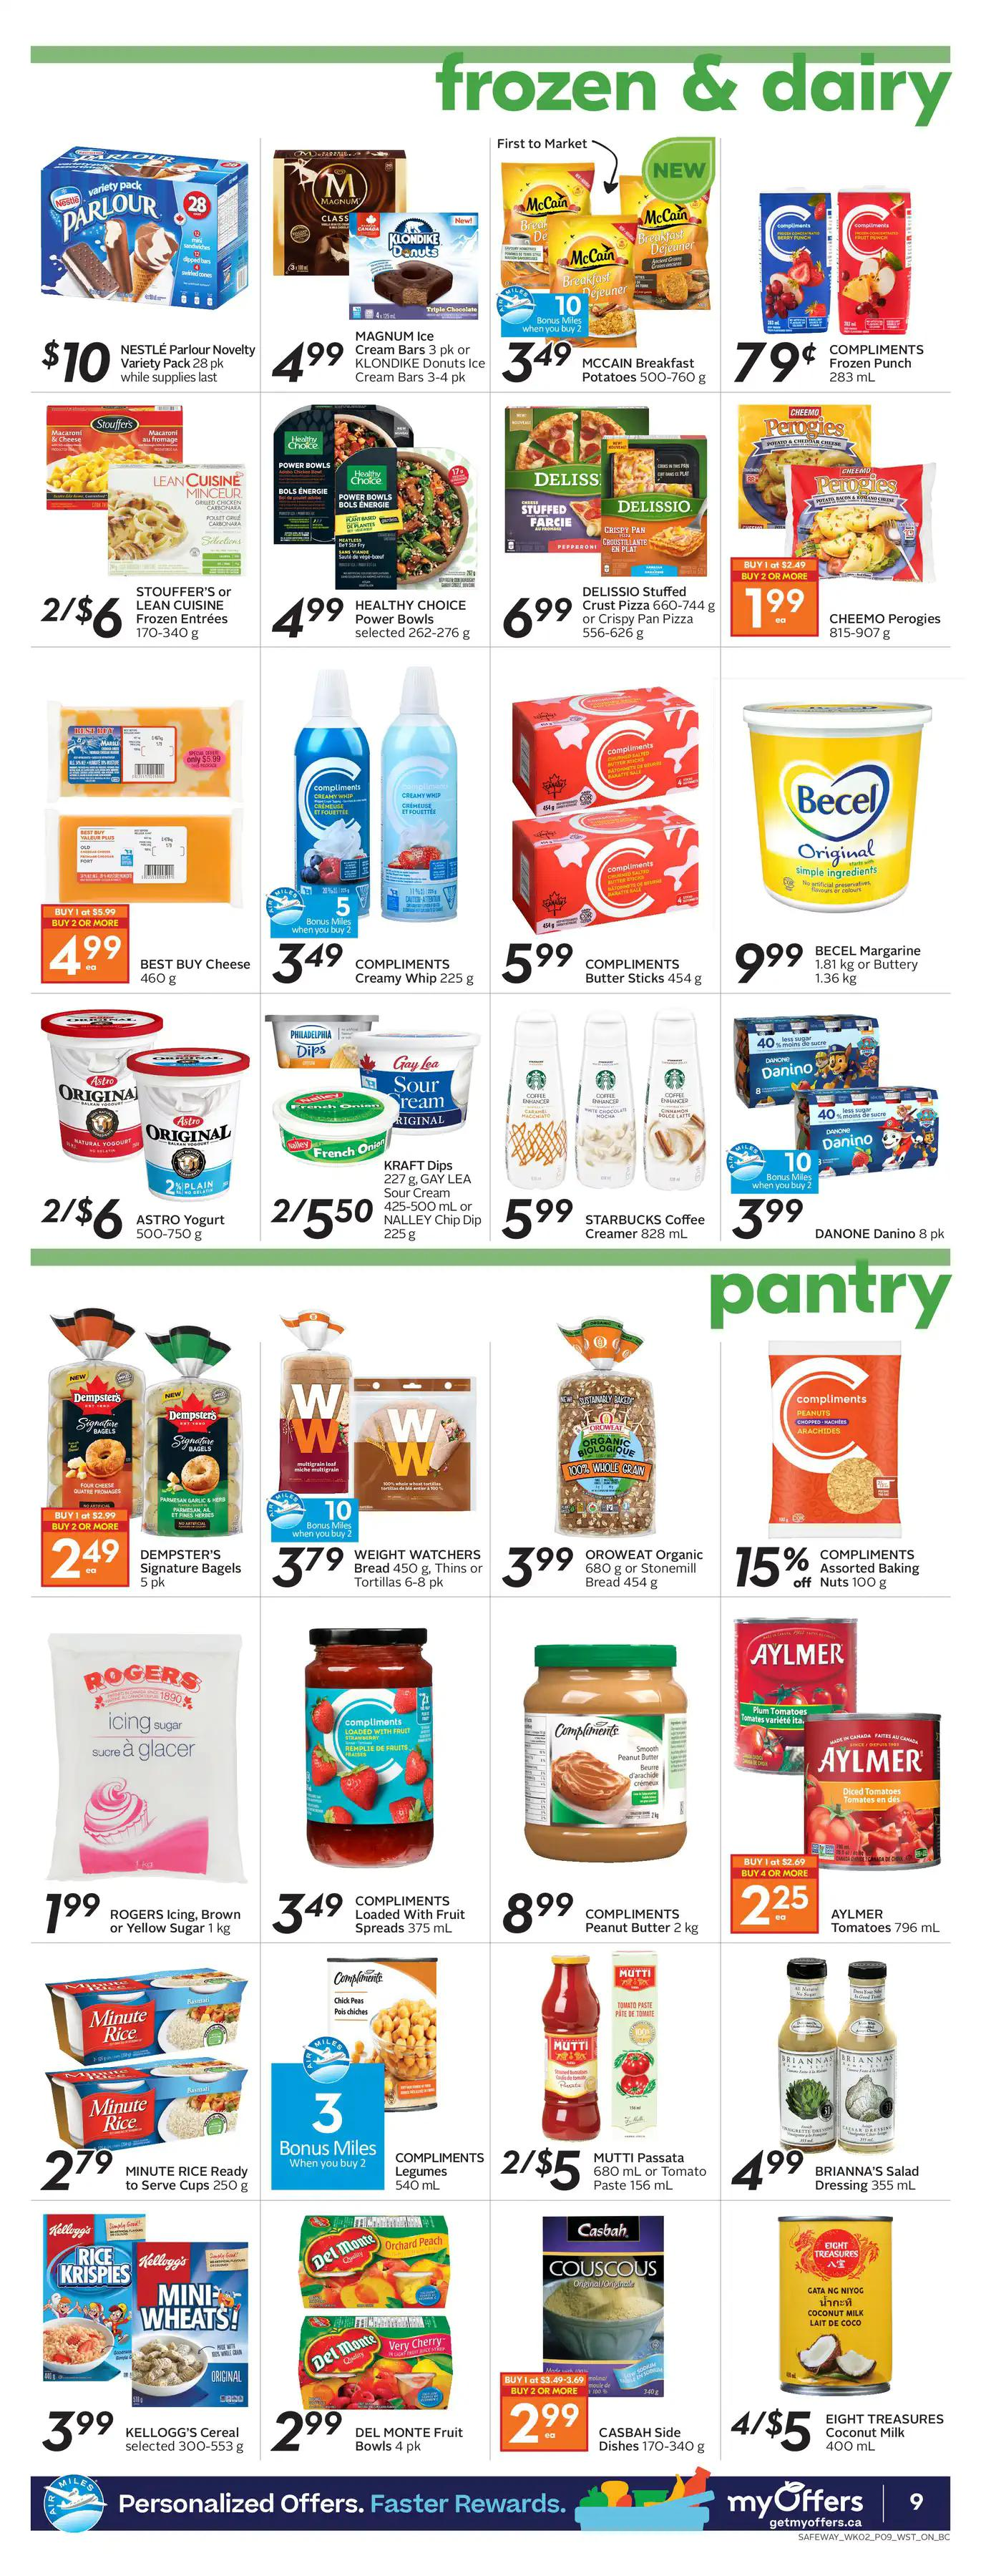 Safeway - Weekly Flyer Specials - Page 10